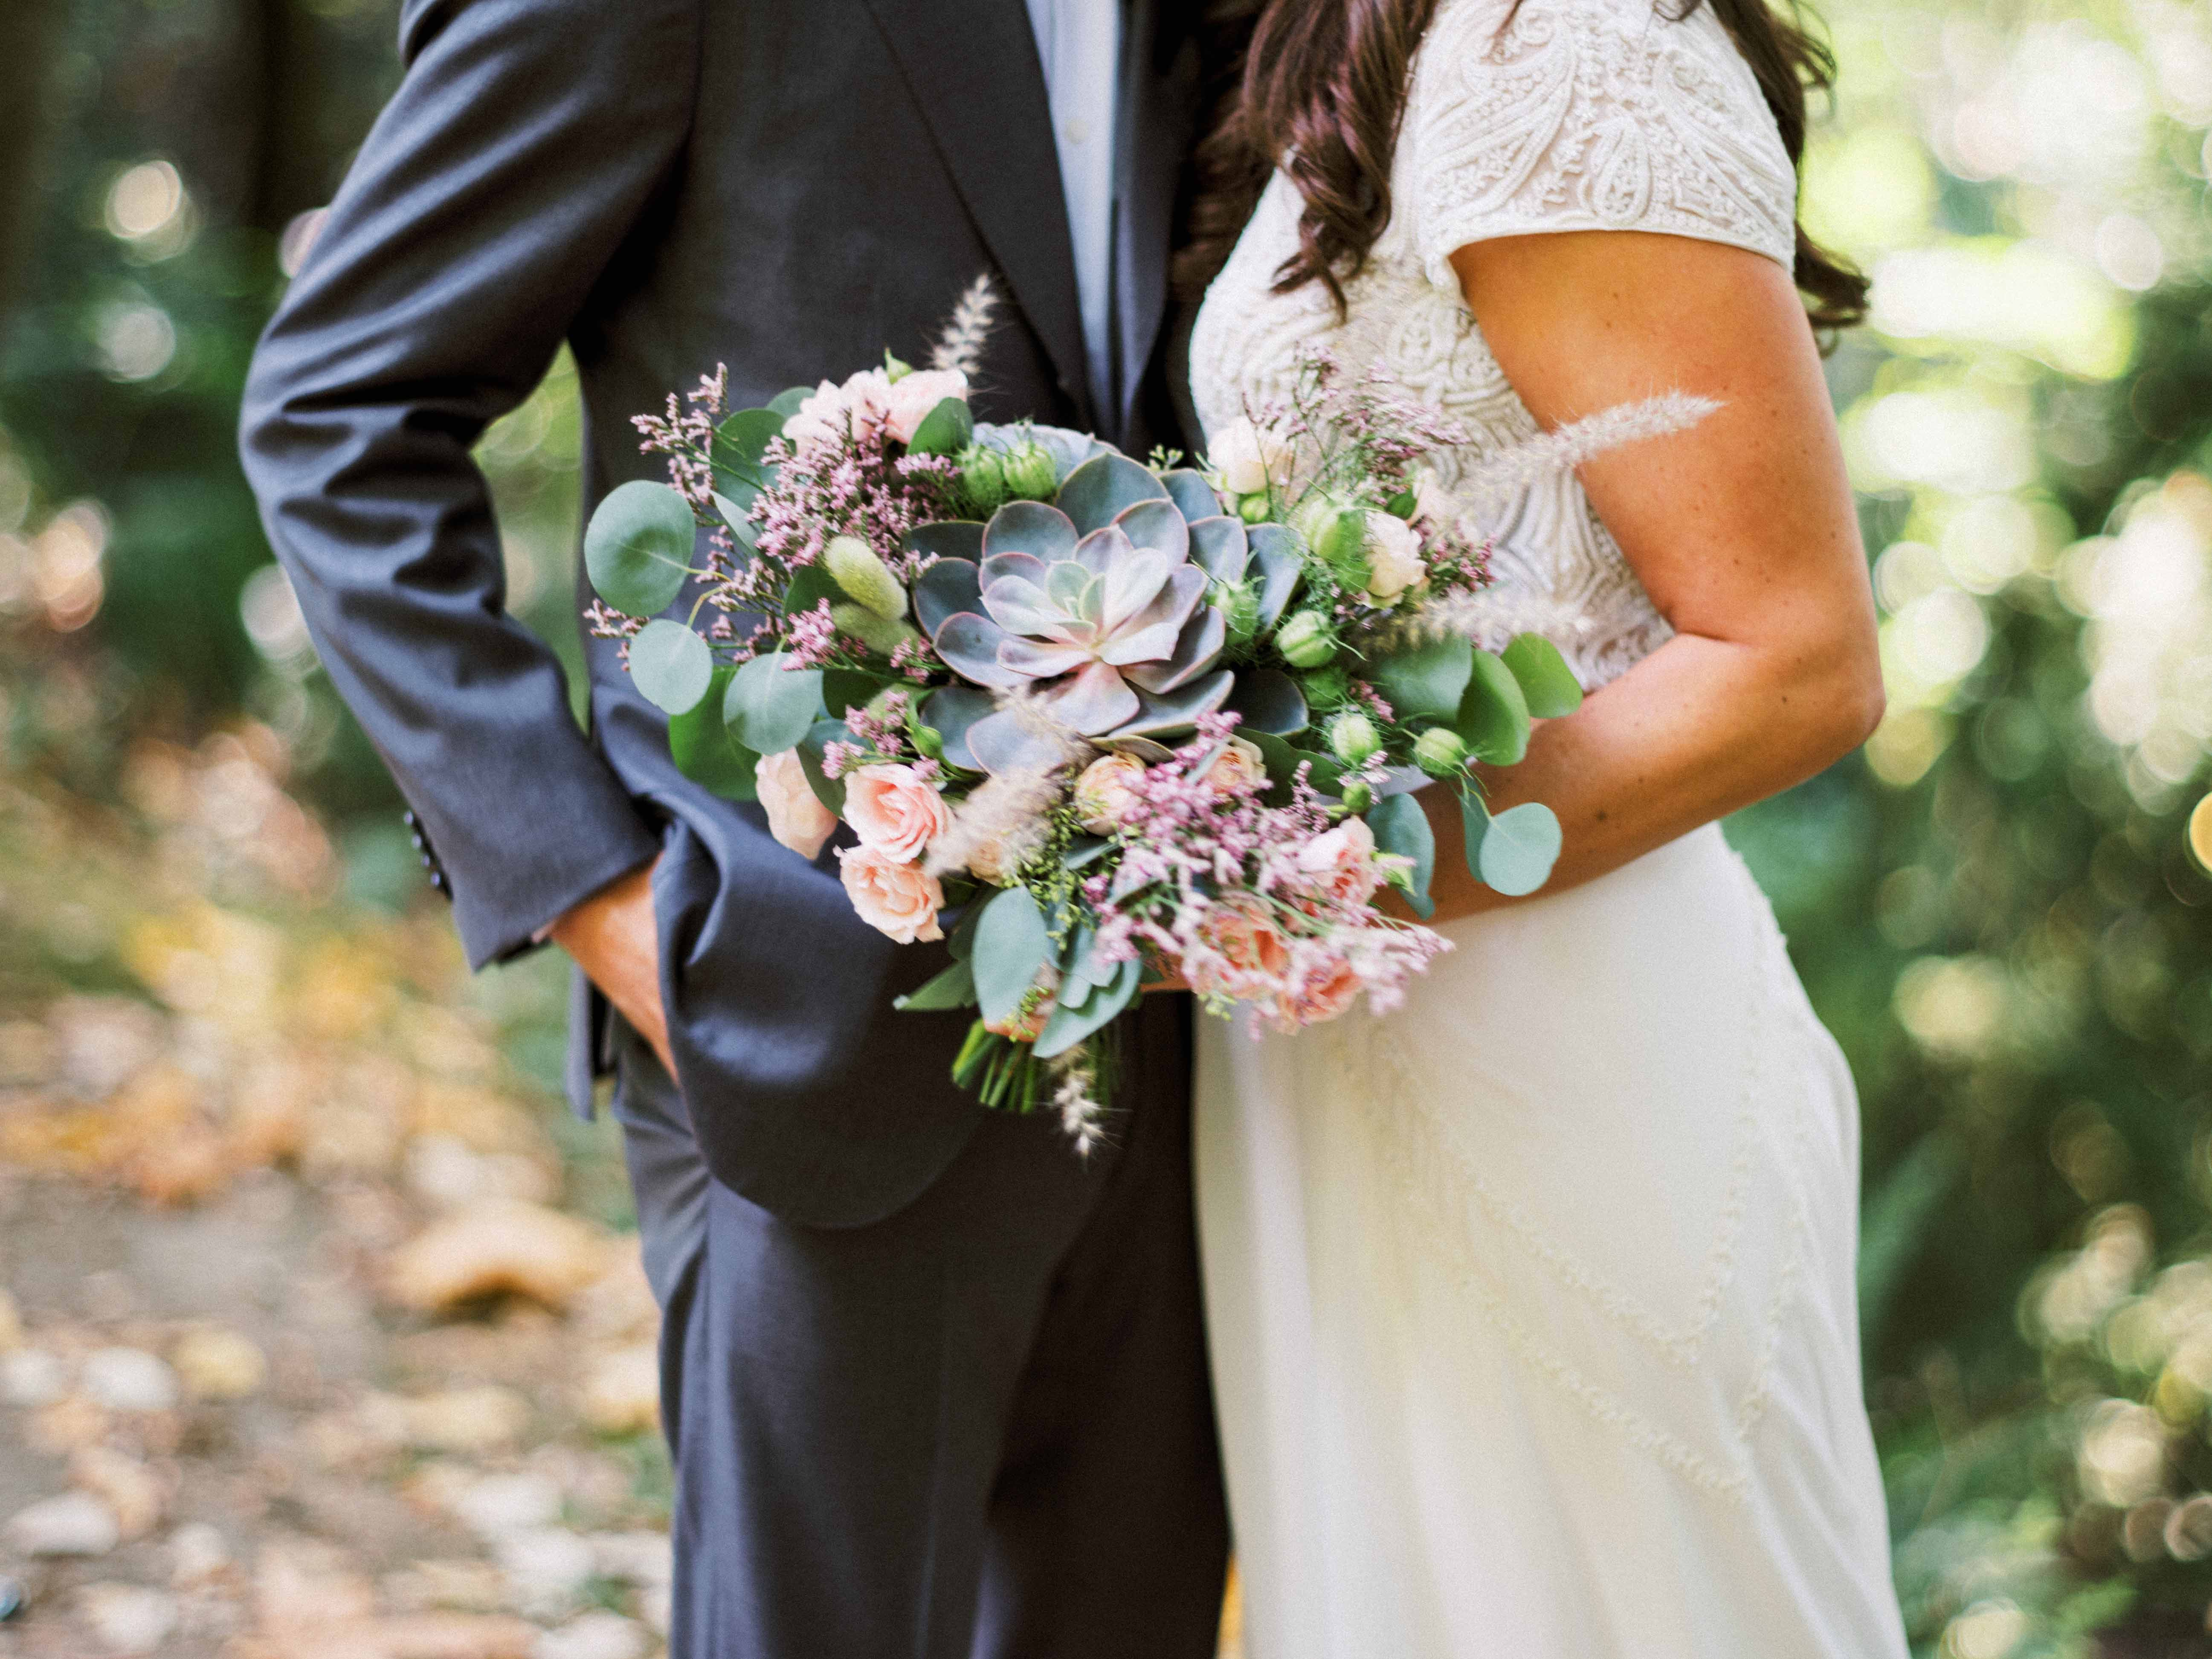 A unique bouquet with a large succulent - Woodmark Hotel Wedding by Flora Nova Design Seattle